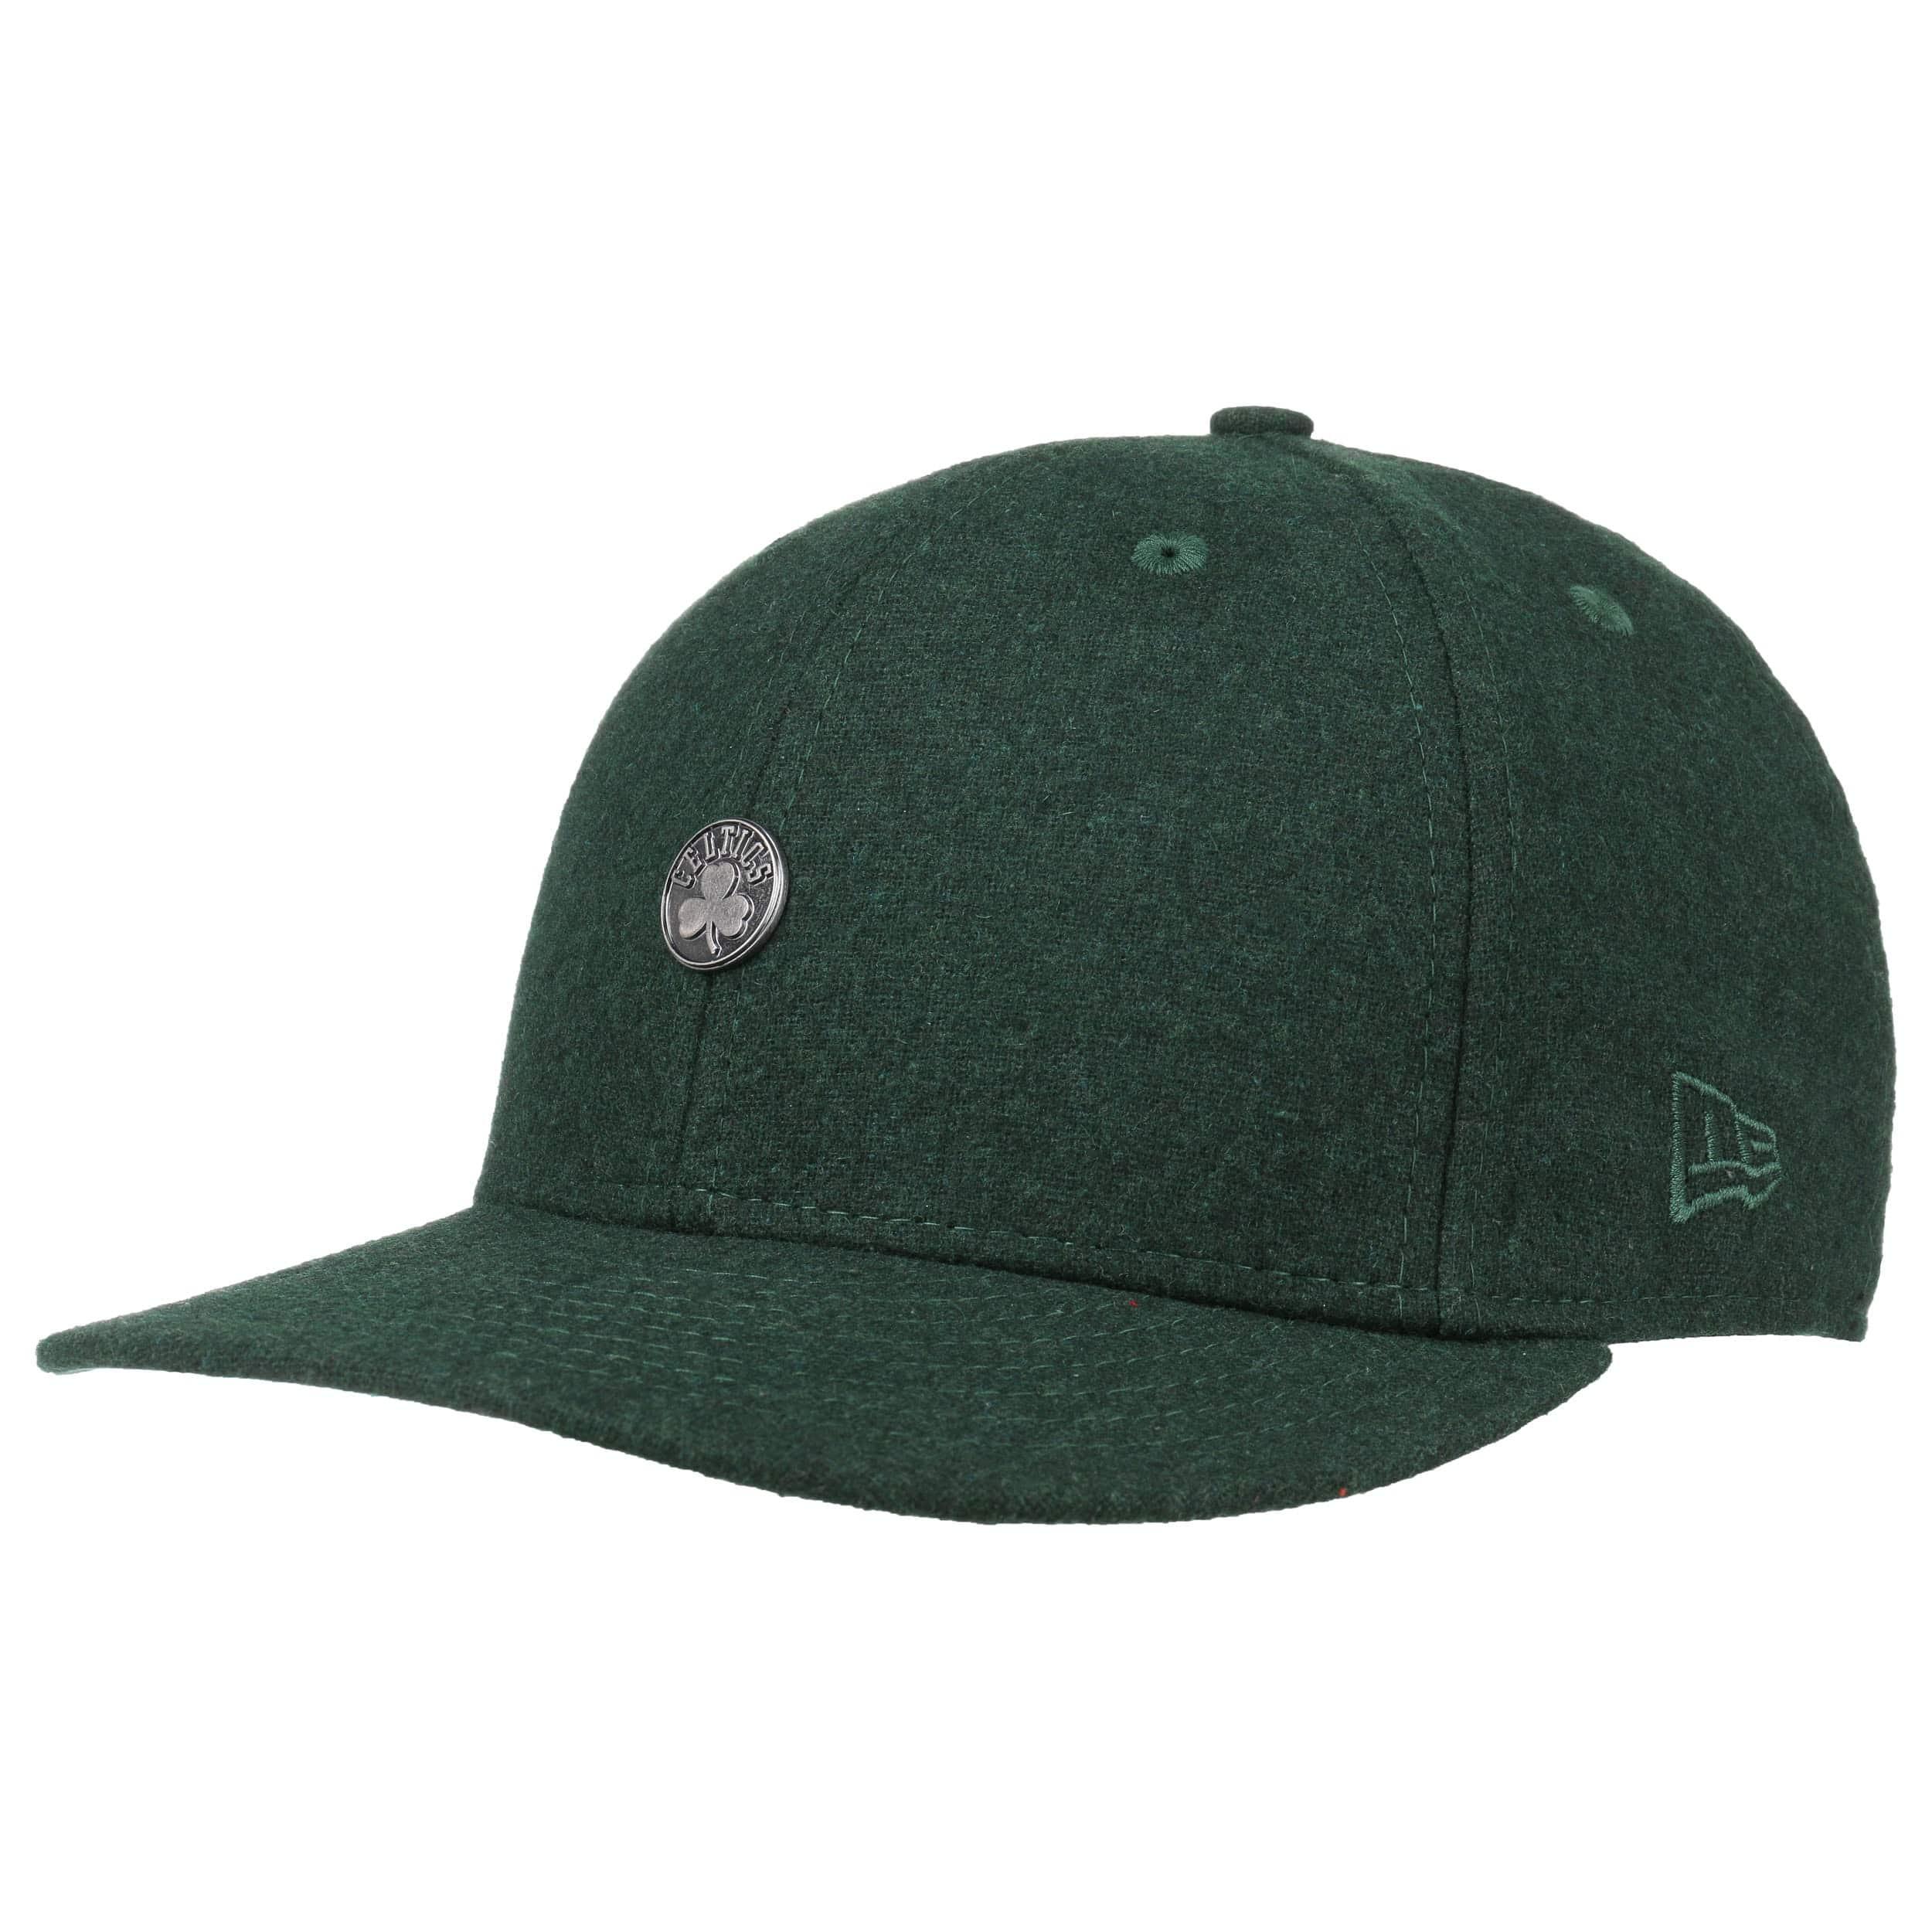 51e9fed7505073 ... 59Fifty Low Profile Pin Celtics Cap by New Era - dark green 6